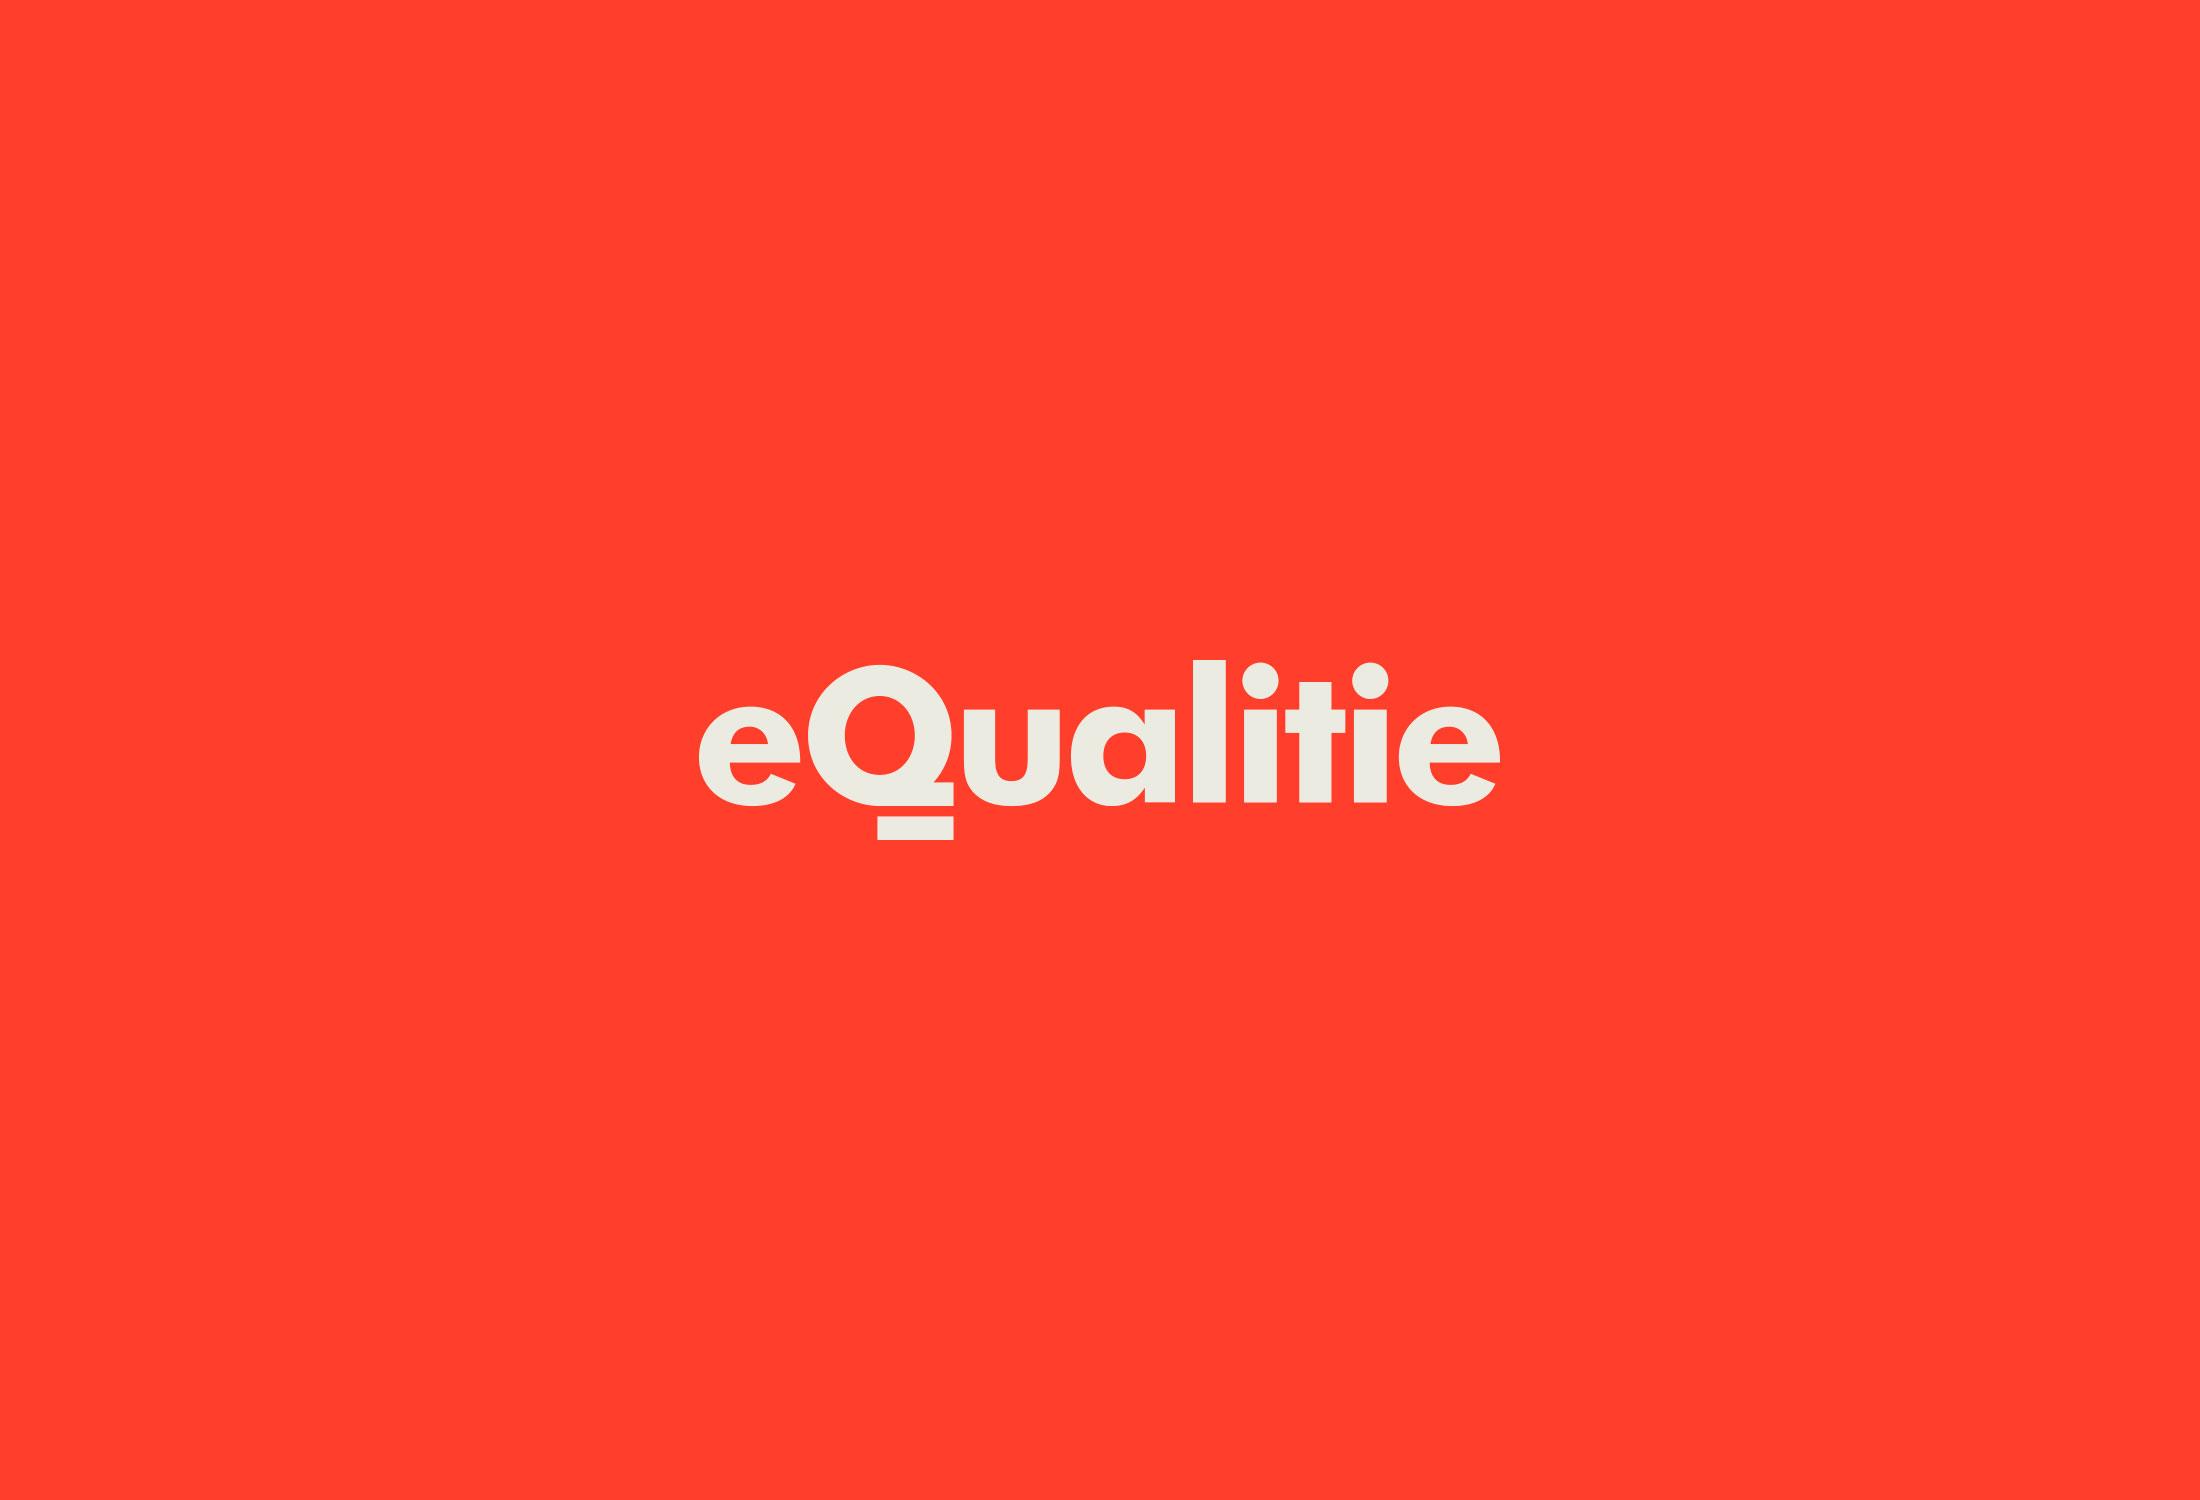 eQualitie logo